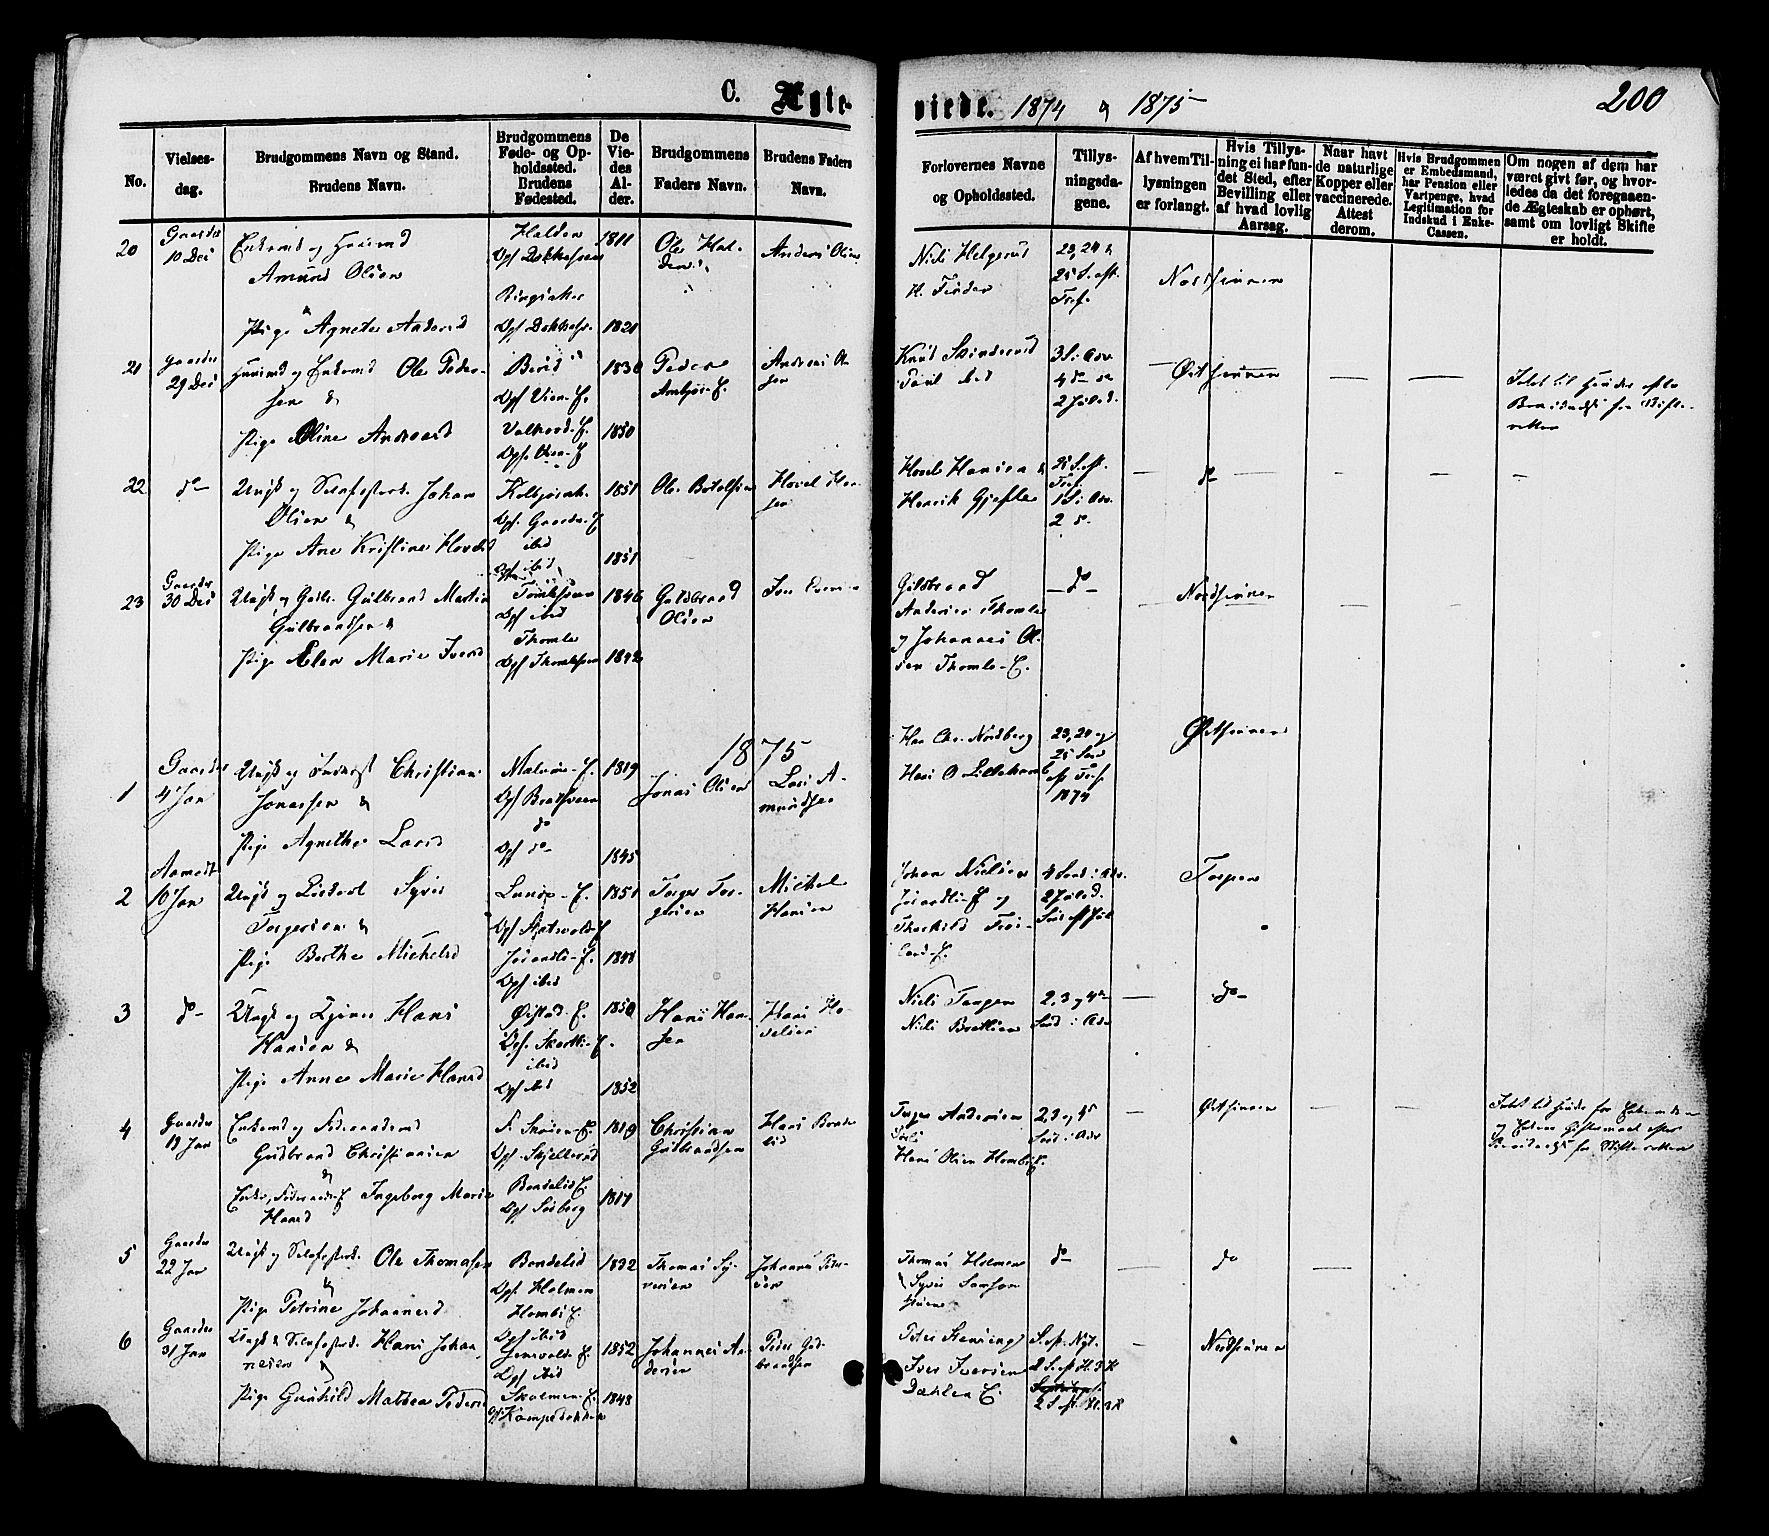 SAH, Nordre Land prestekontor, Ministerialbok nr. 2, 1872-1881, s. 200